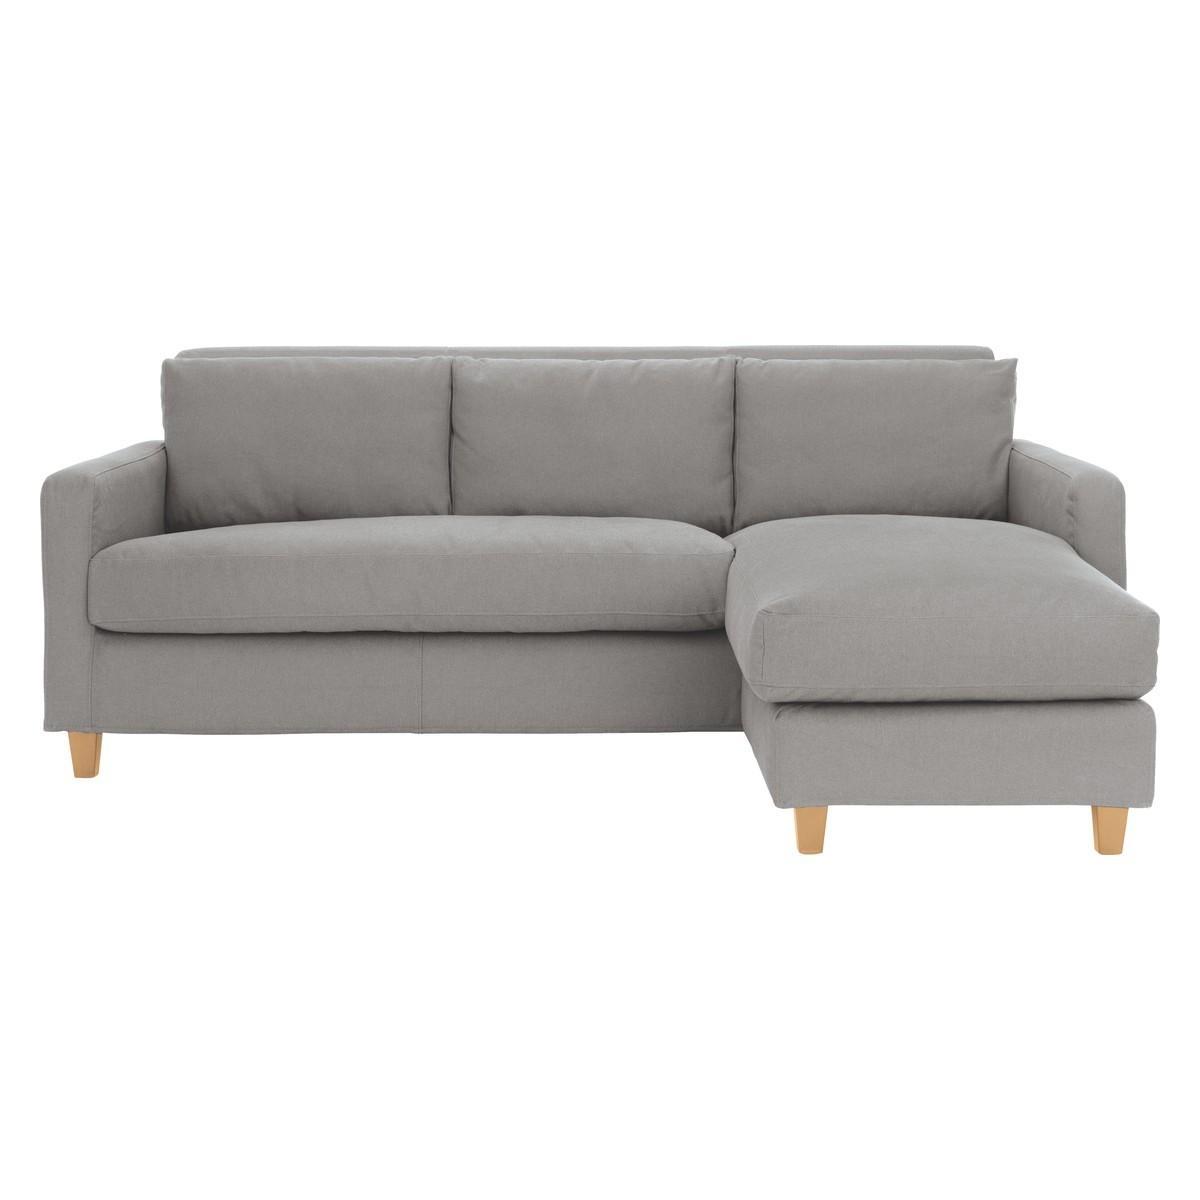 marco gray chaise sofa rv jackknife cushions 20 best ideas sofas